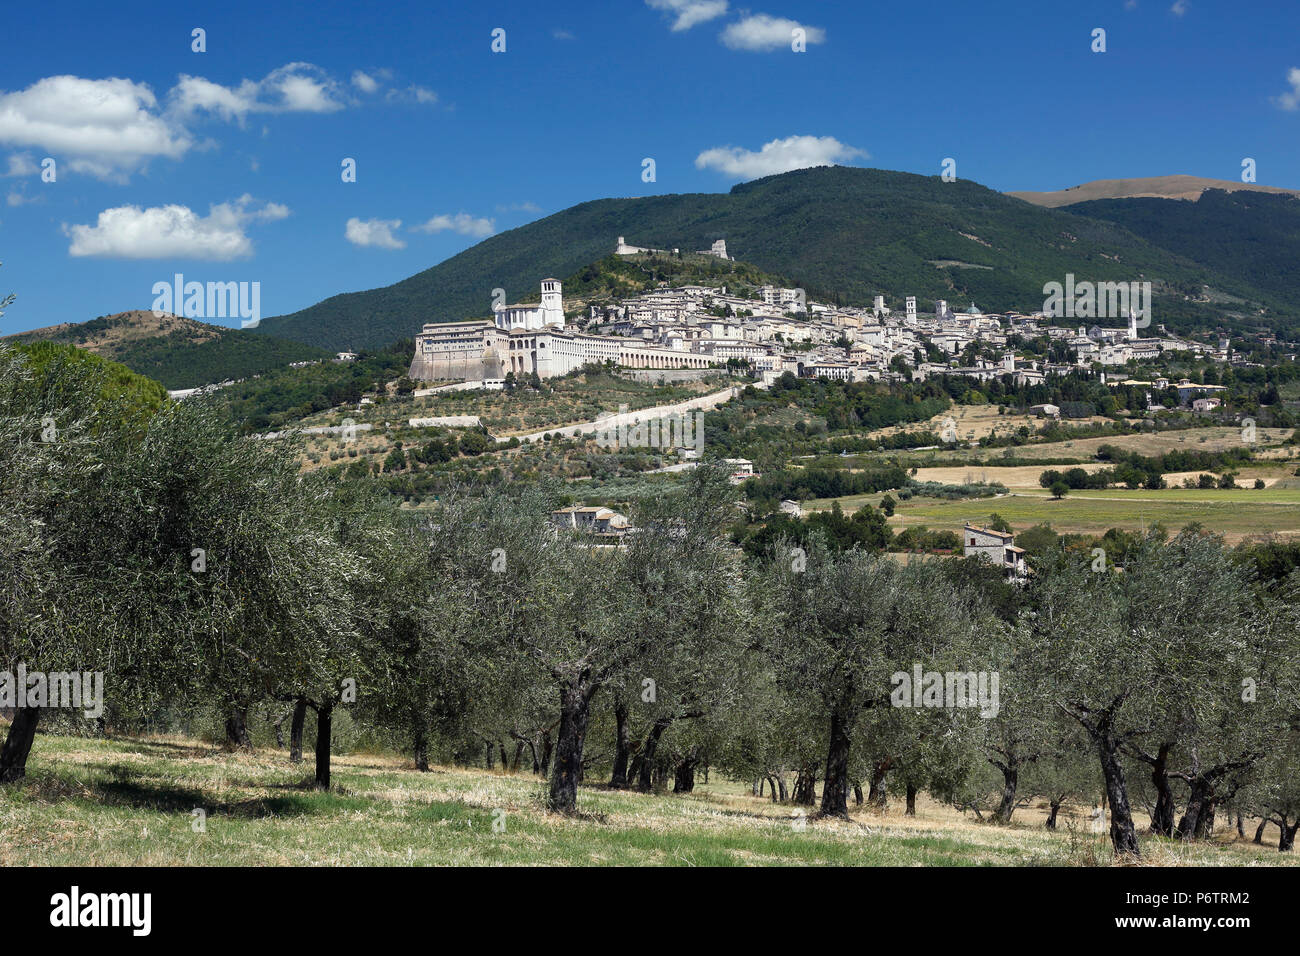 Cityscape, Assisi, Umbria, Italy - Stock Image